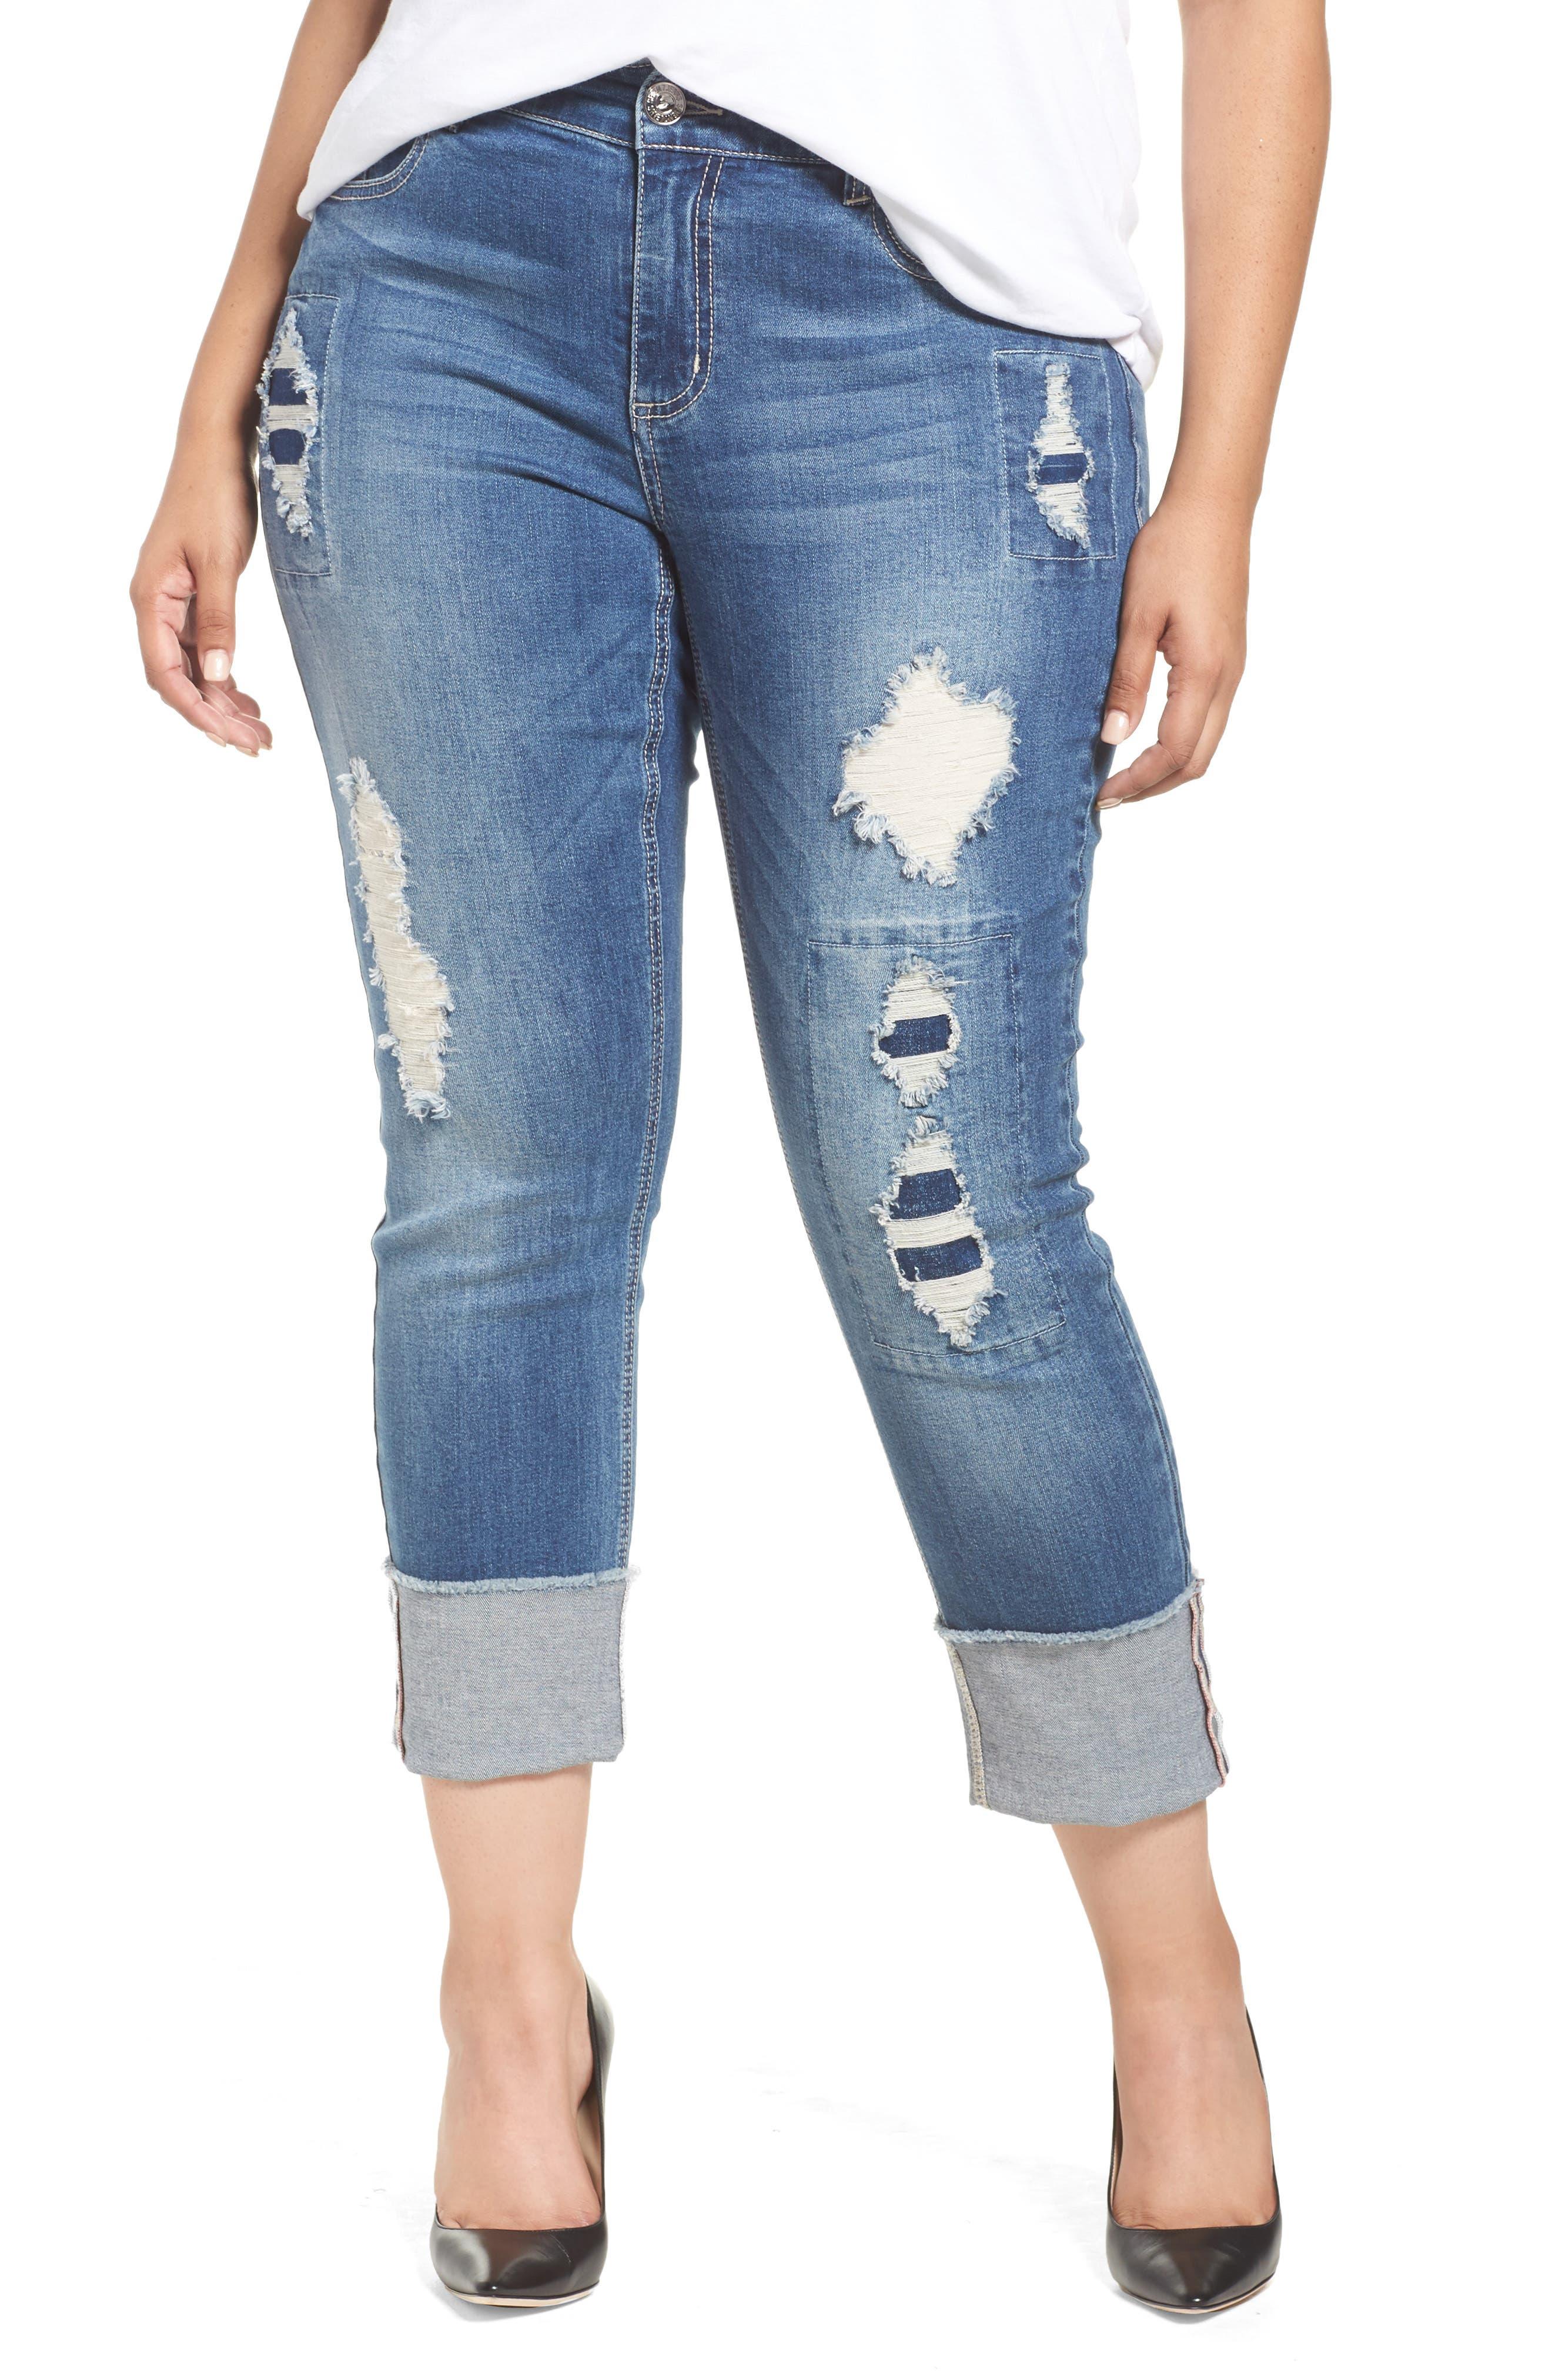 Main Image - Seven7 Distressed Slim Raw Hem Cuffed Jeans (Concorde) (Plus Size)